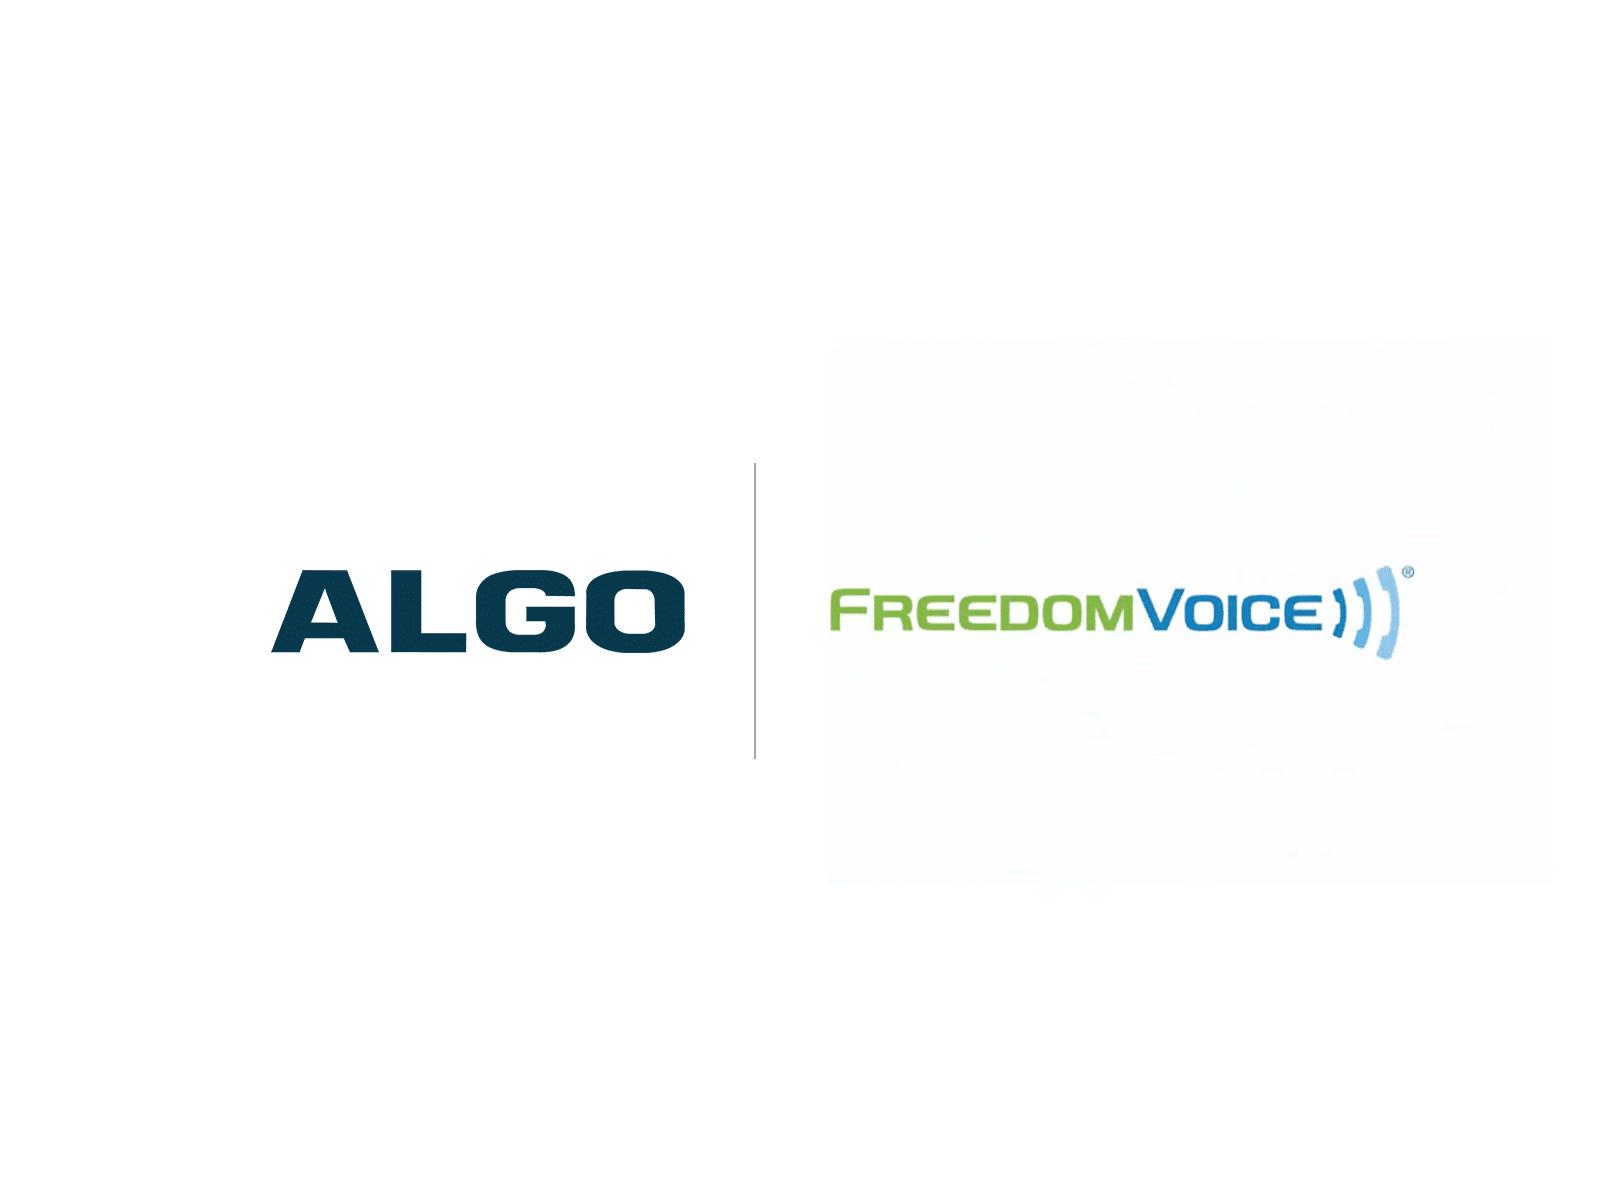 Algo FreedomVoice Compatibility Logo